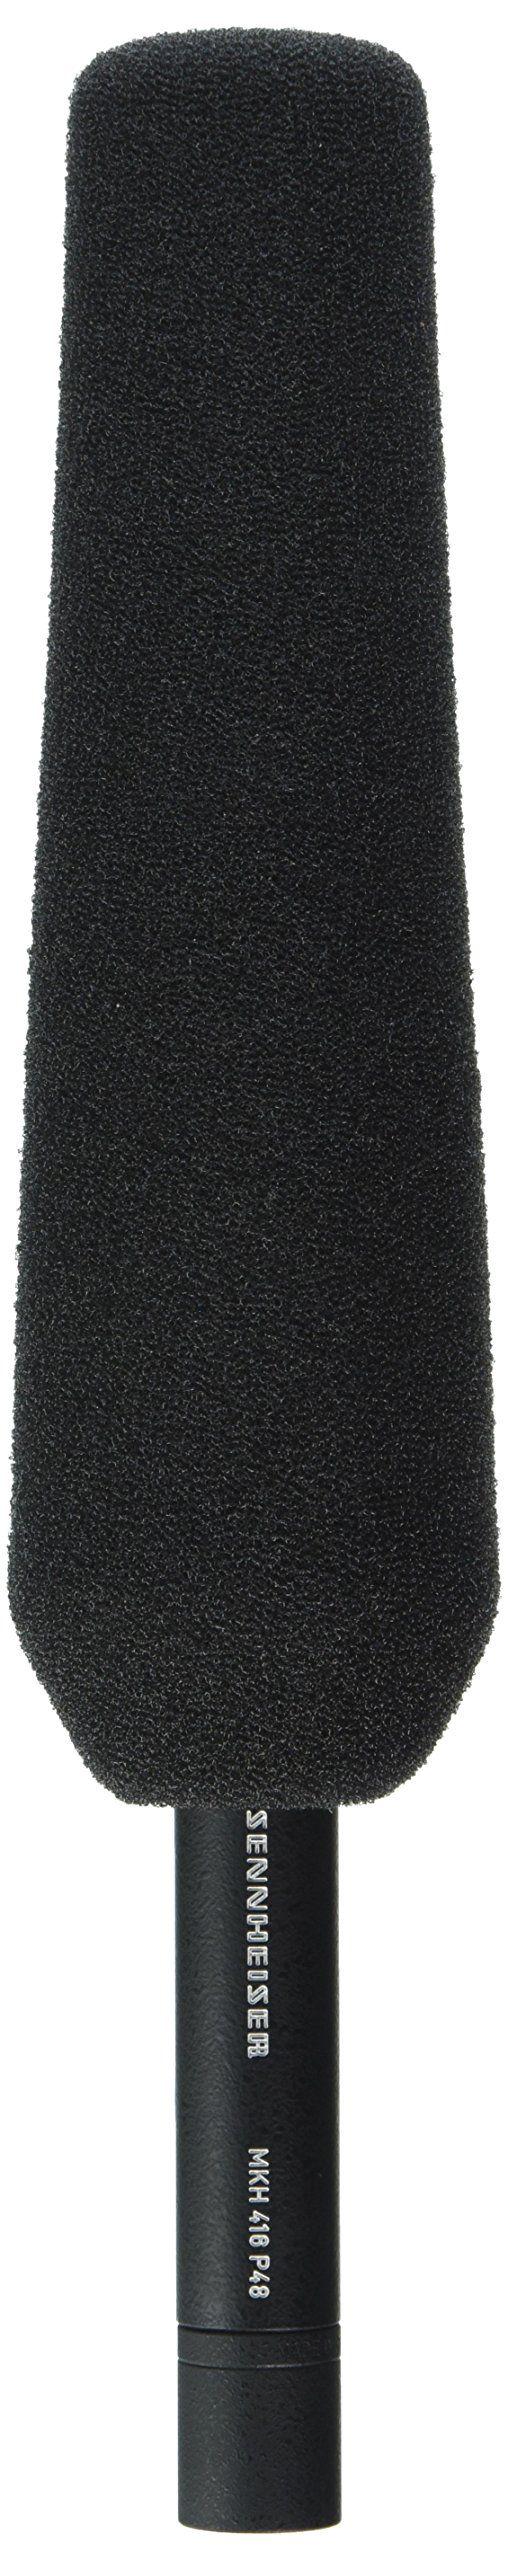 Sennheiser MKH416-P48U3 Super-Cardioid Shotgun Tube Condenser Microphone